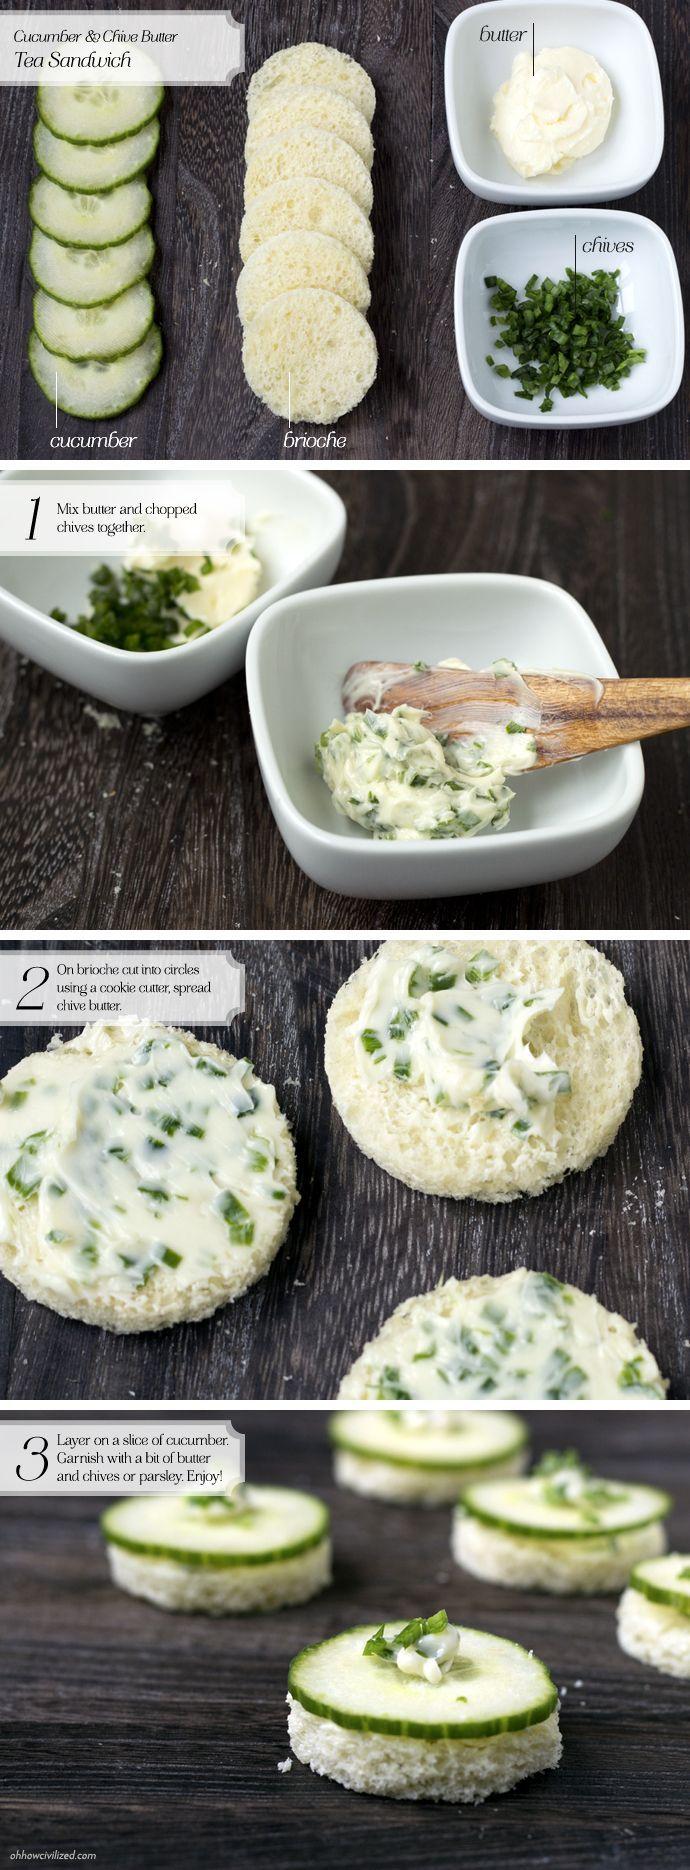 Tea Sandwich: Cucumber & Chive Butter - Vegan w/ Earth Balance